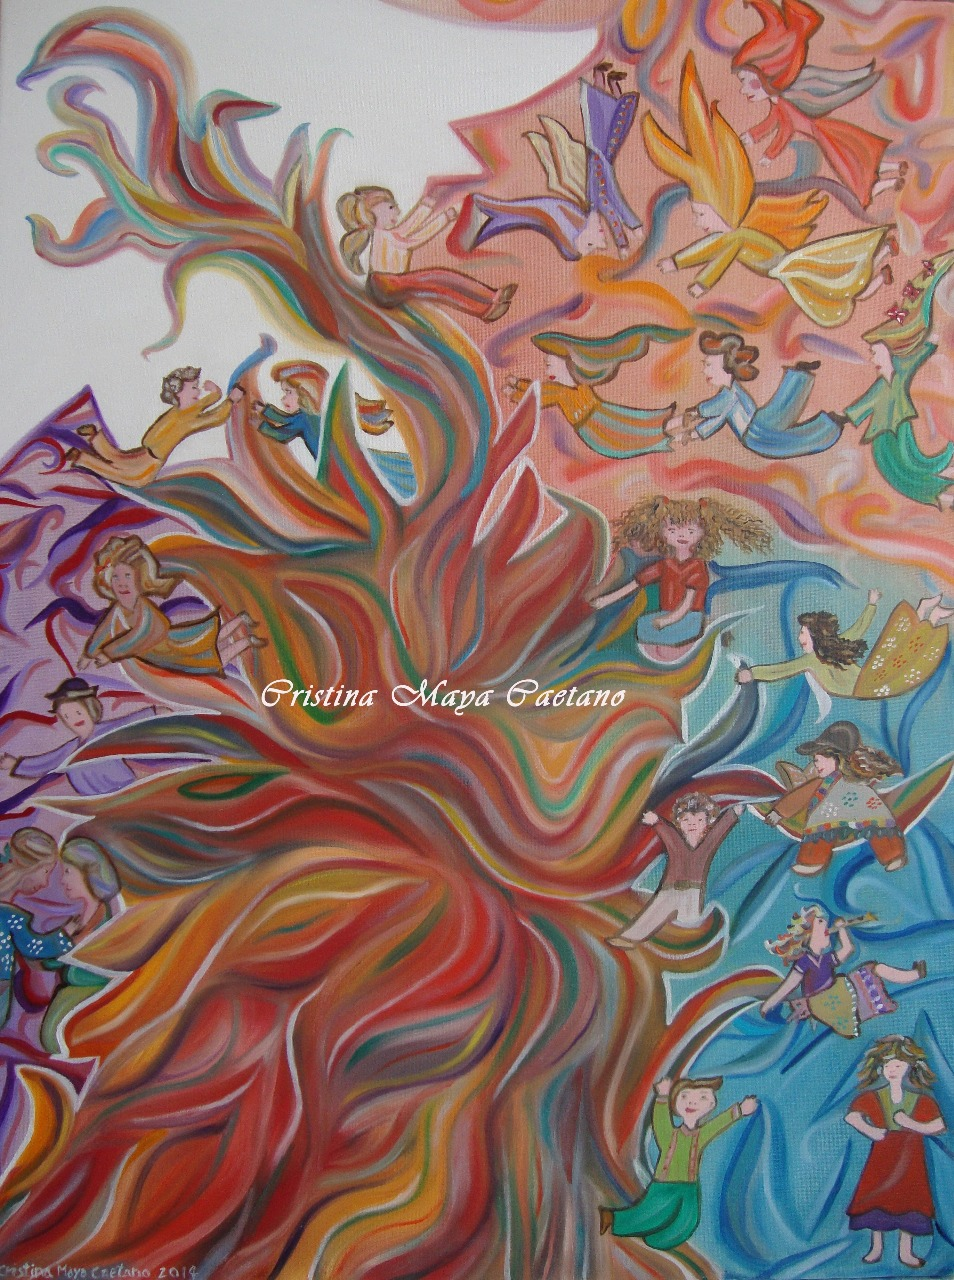 Criaturas Etéricas (Ethereal Creatures) - 60x40cm. 2014